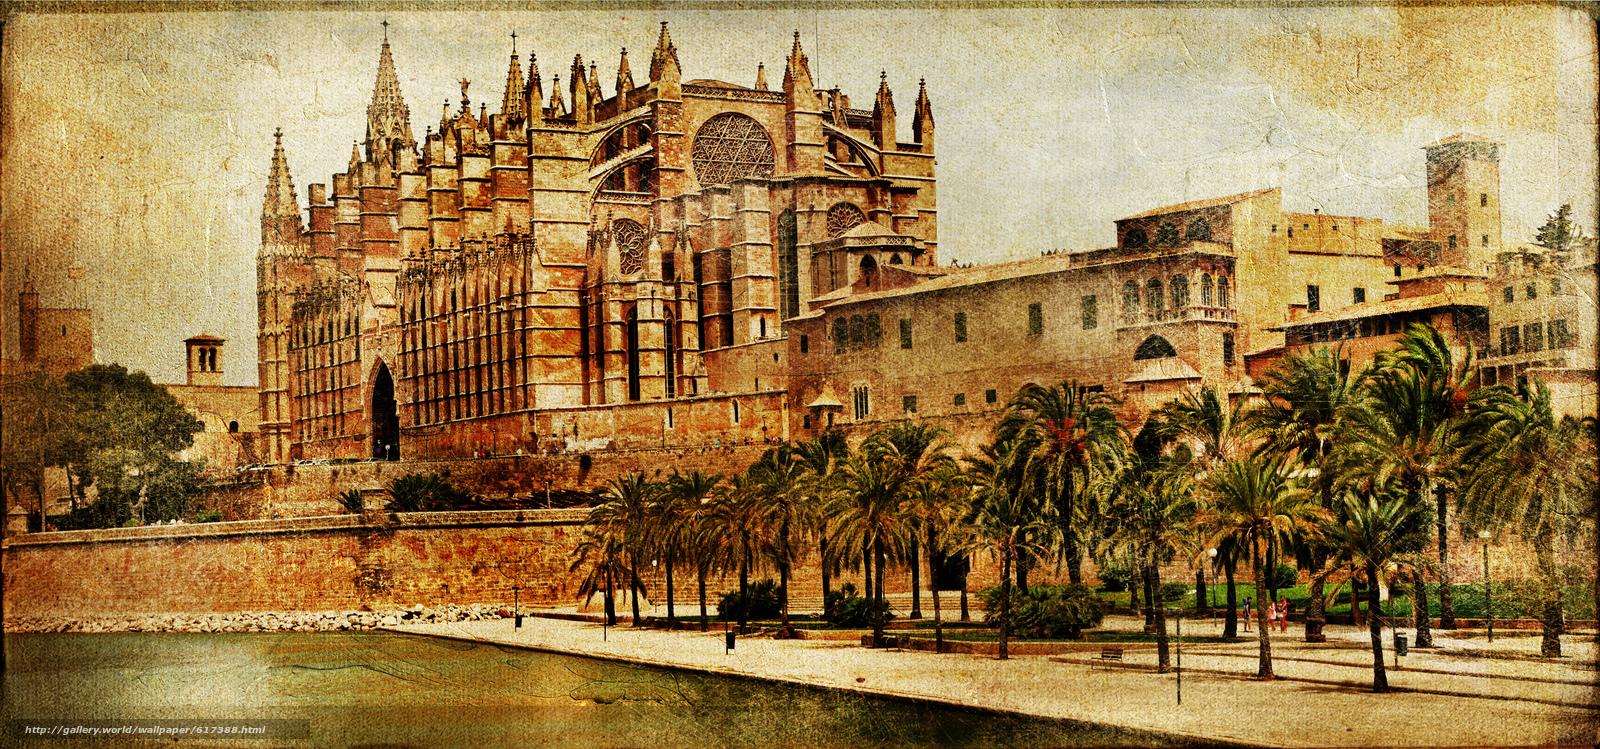 Download wallpaper Mallorca cathedral, Palma de Mallorca  -> Vintage Möbel Palma De Mallorca